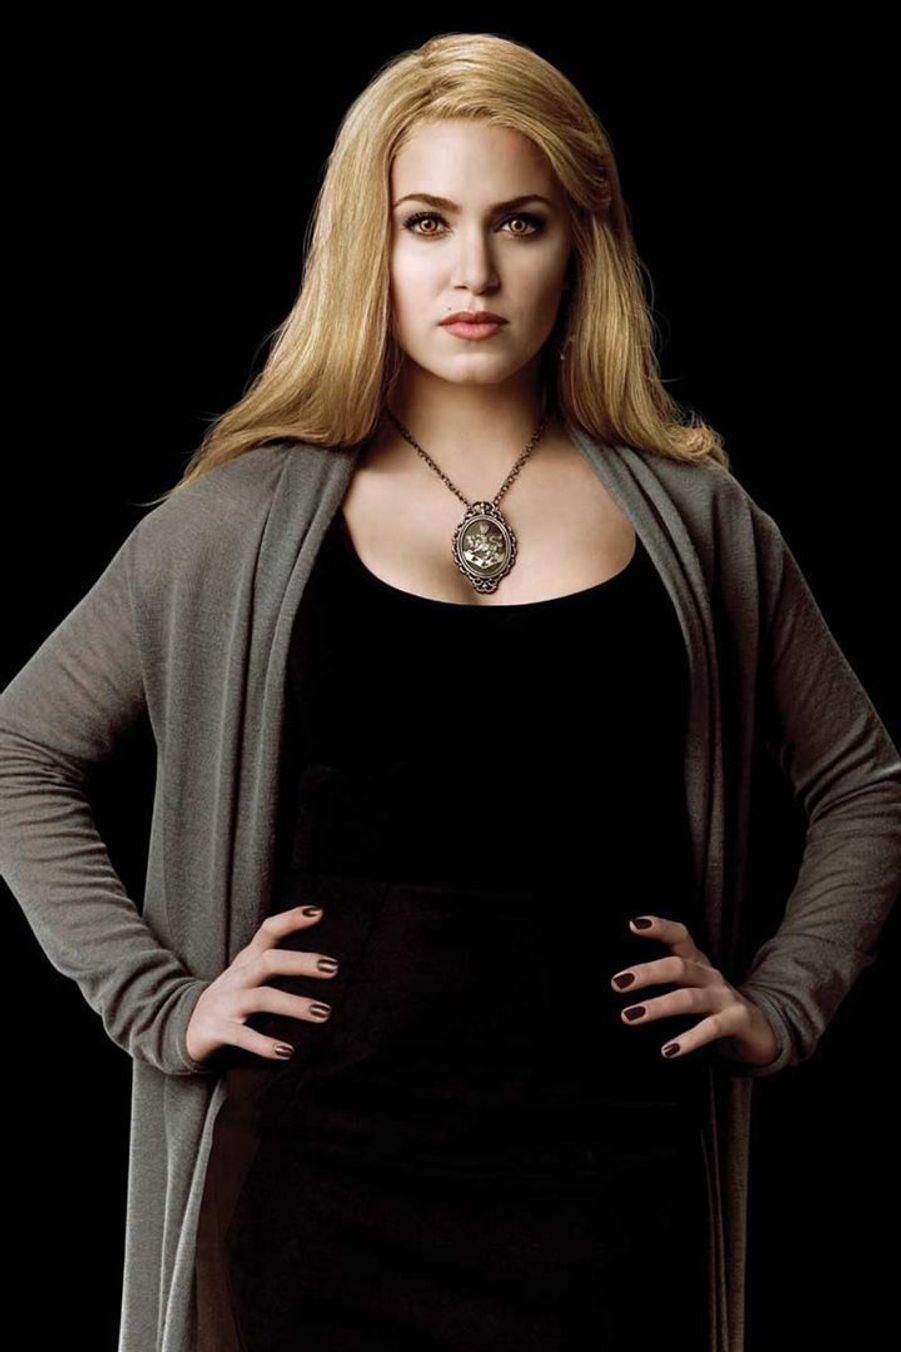 Nikki Reed alias Rosalie Hale